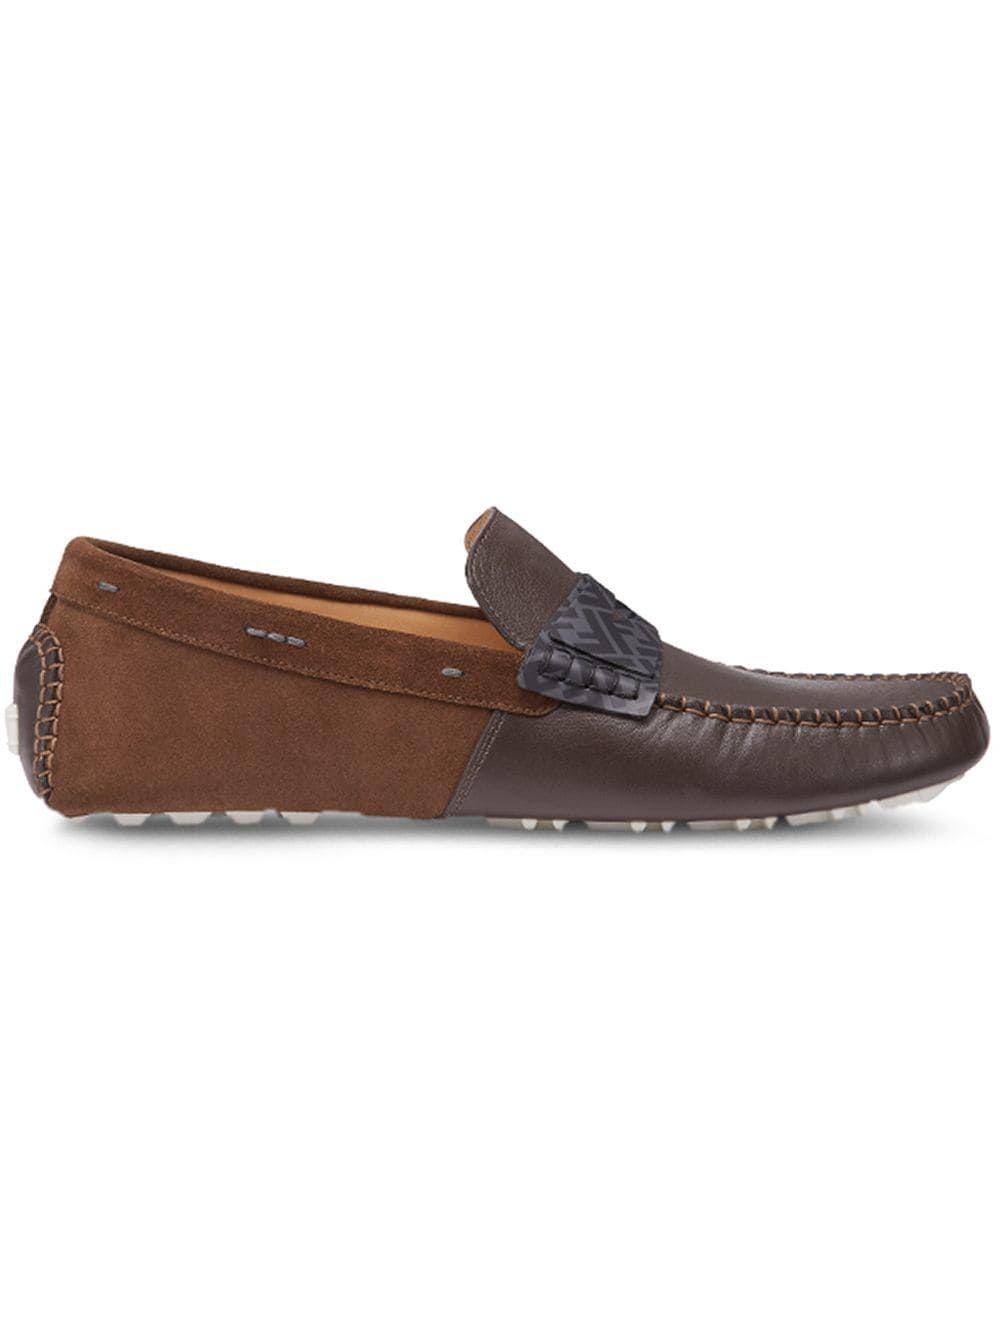 8472708b9af Fendi driving loafers brown fendi shoes fendi jpg 1000x1334 Fendi loafers